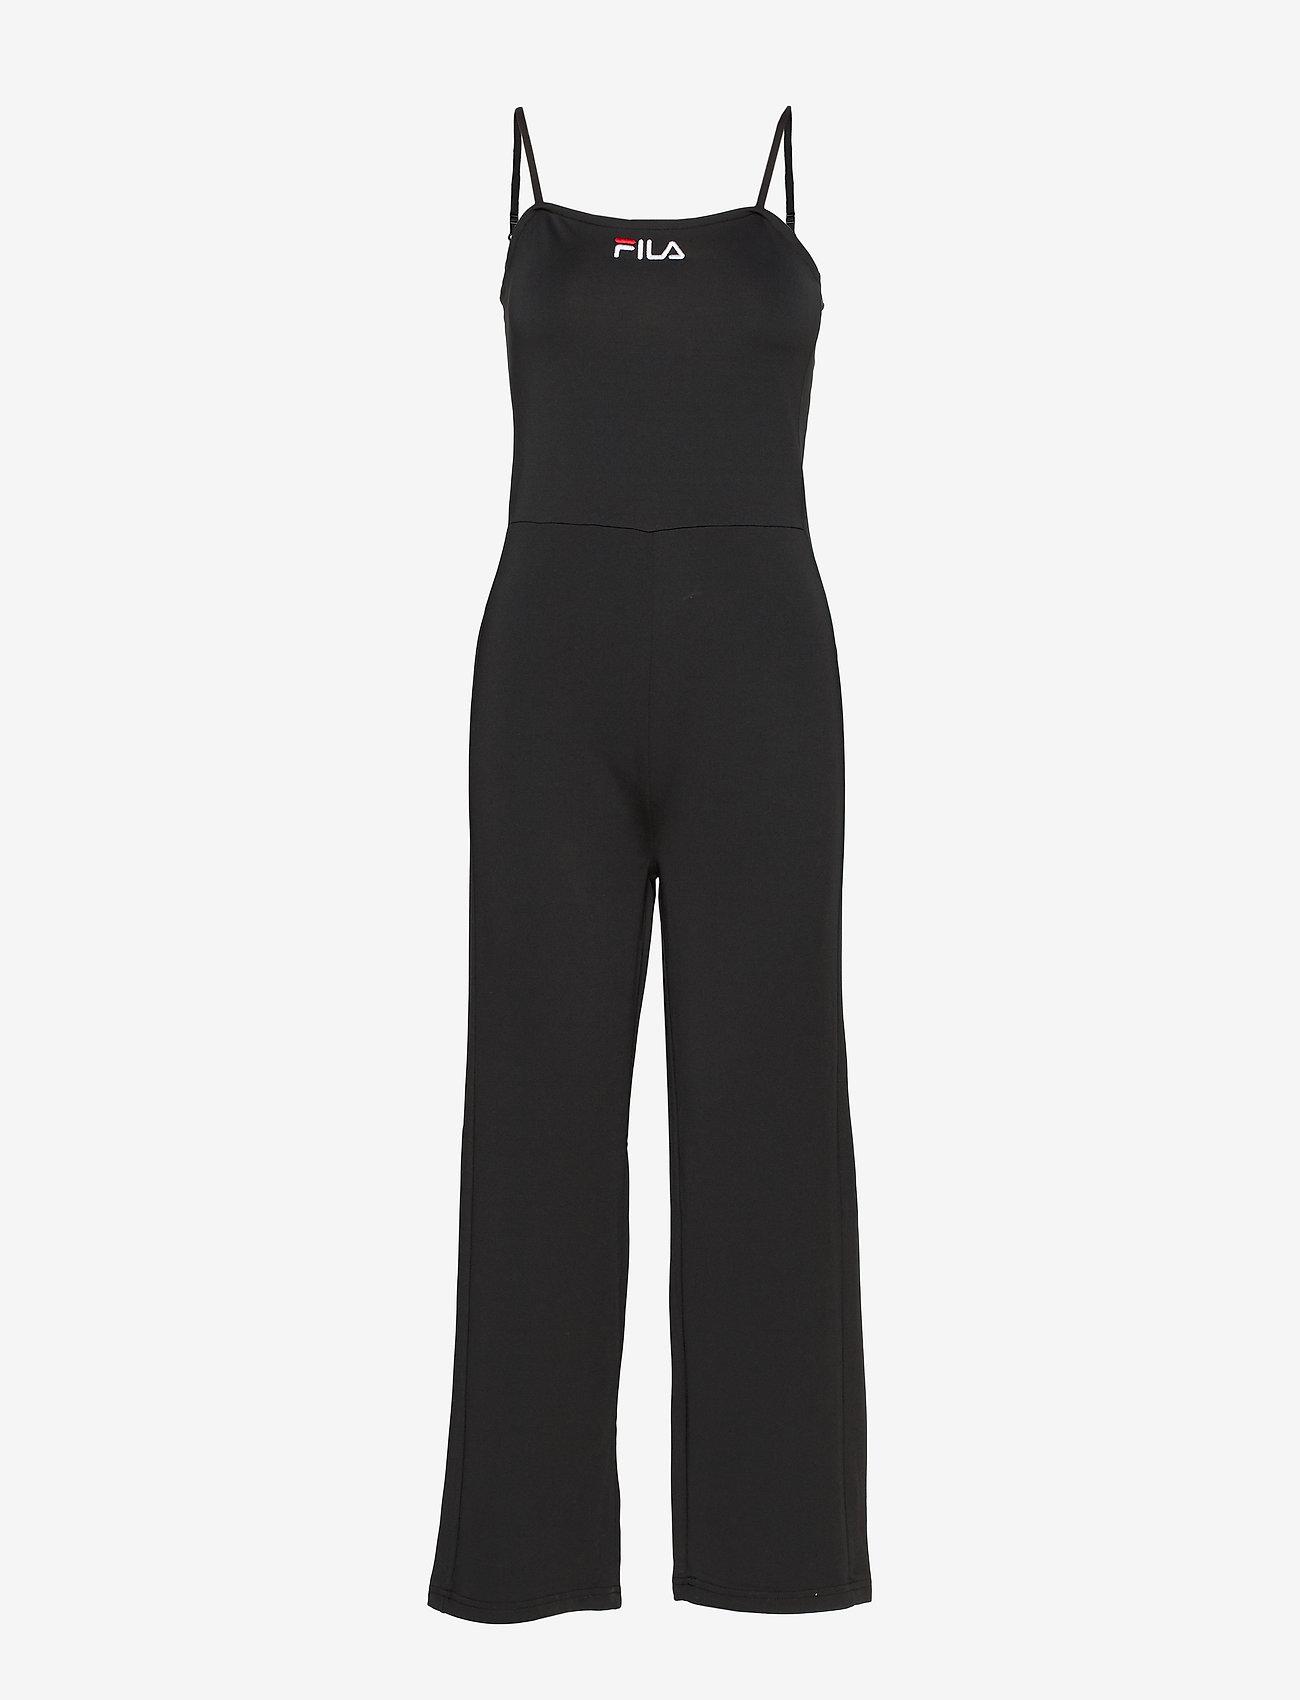 FILA - WOMEN TANUJA jumpsuit - 7/8 length - sportieve tops - black - 0